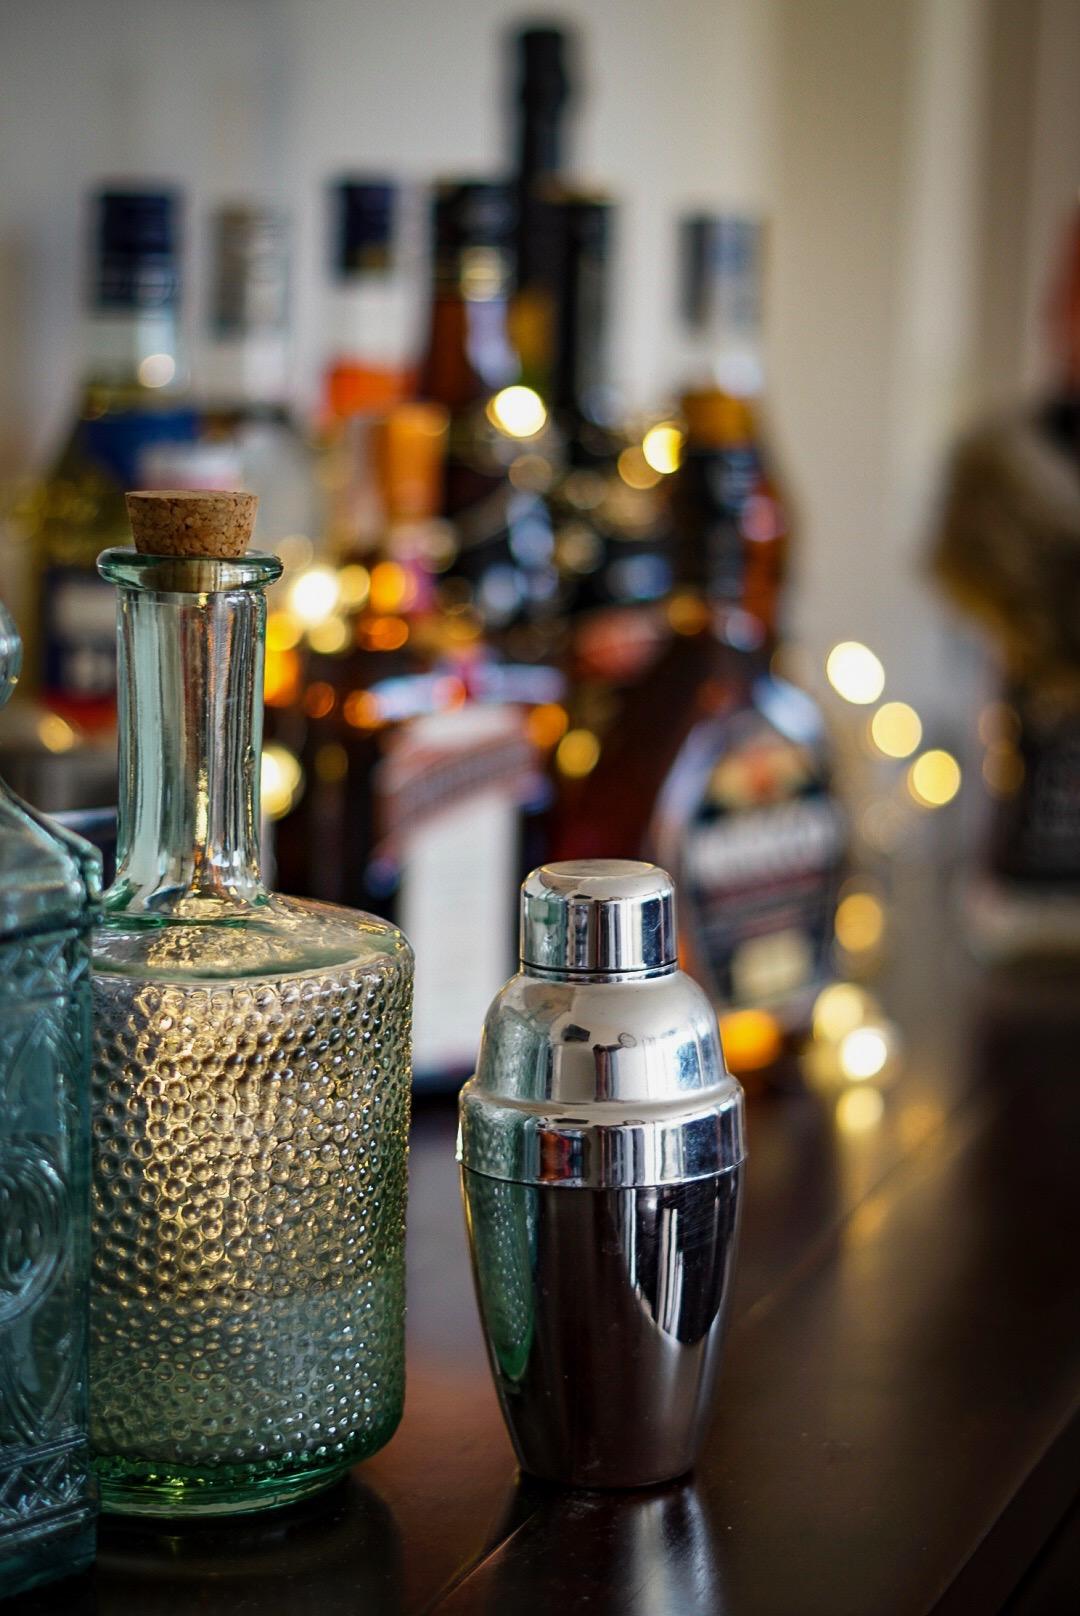 TK Maxx homeware glass bottle and cocktail shaker home bar